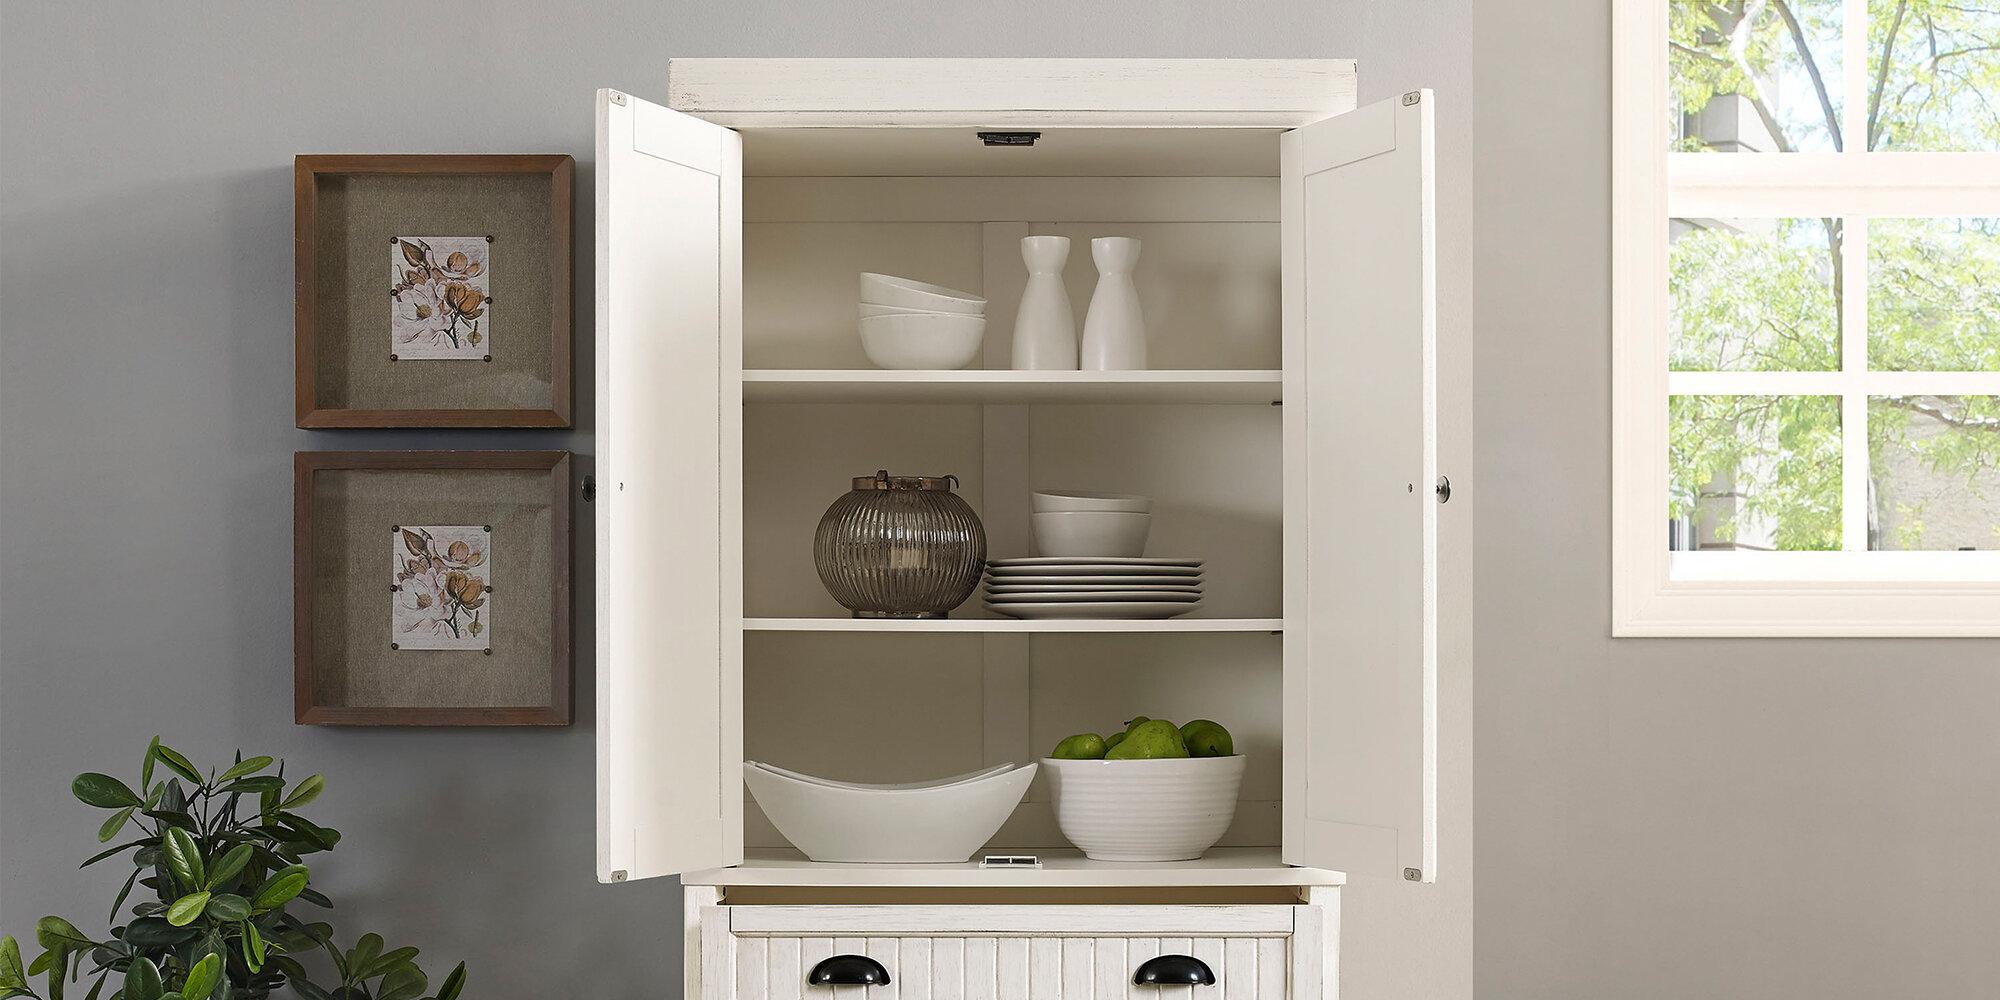 Kitchen Storage With Coastal Cottage Charm